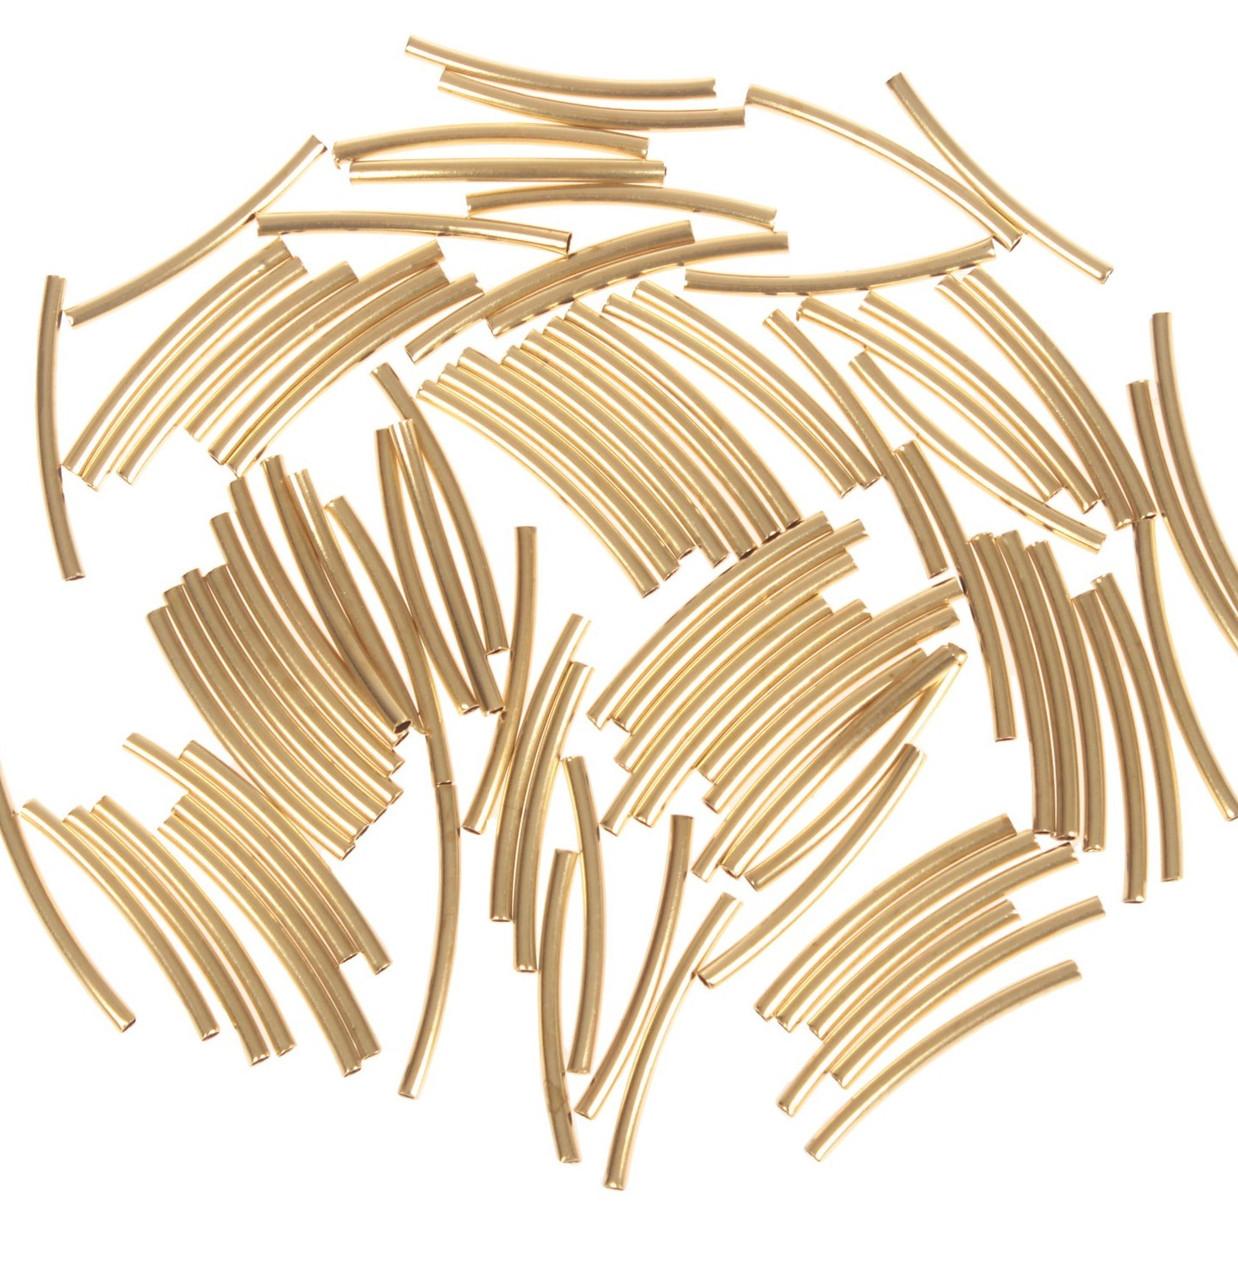 "Декор для творчества металл ""Изогнутая трубка"" набор 90 шт 2,5х0,2 см"